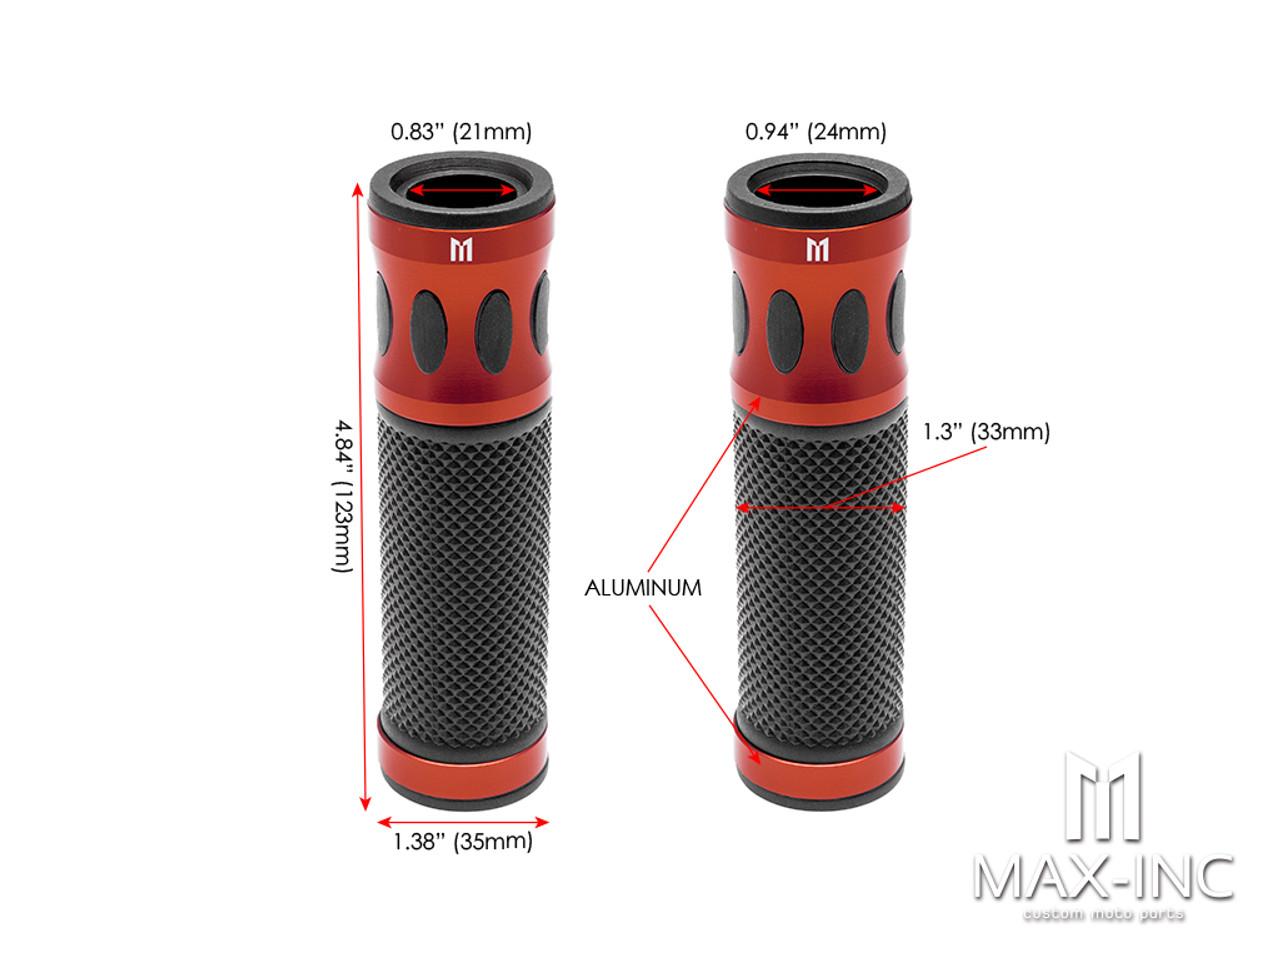 "Oval Cut Dark Orange Anodized CNC Machined Aluminum / Rubber Hand Grips - 7/8"" (22mm)"